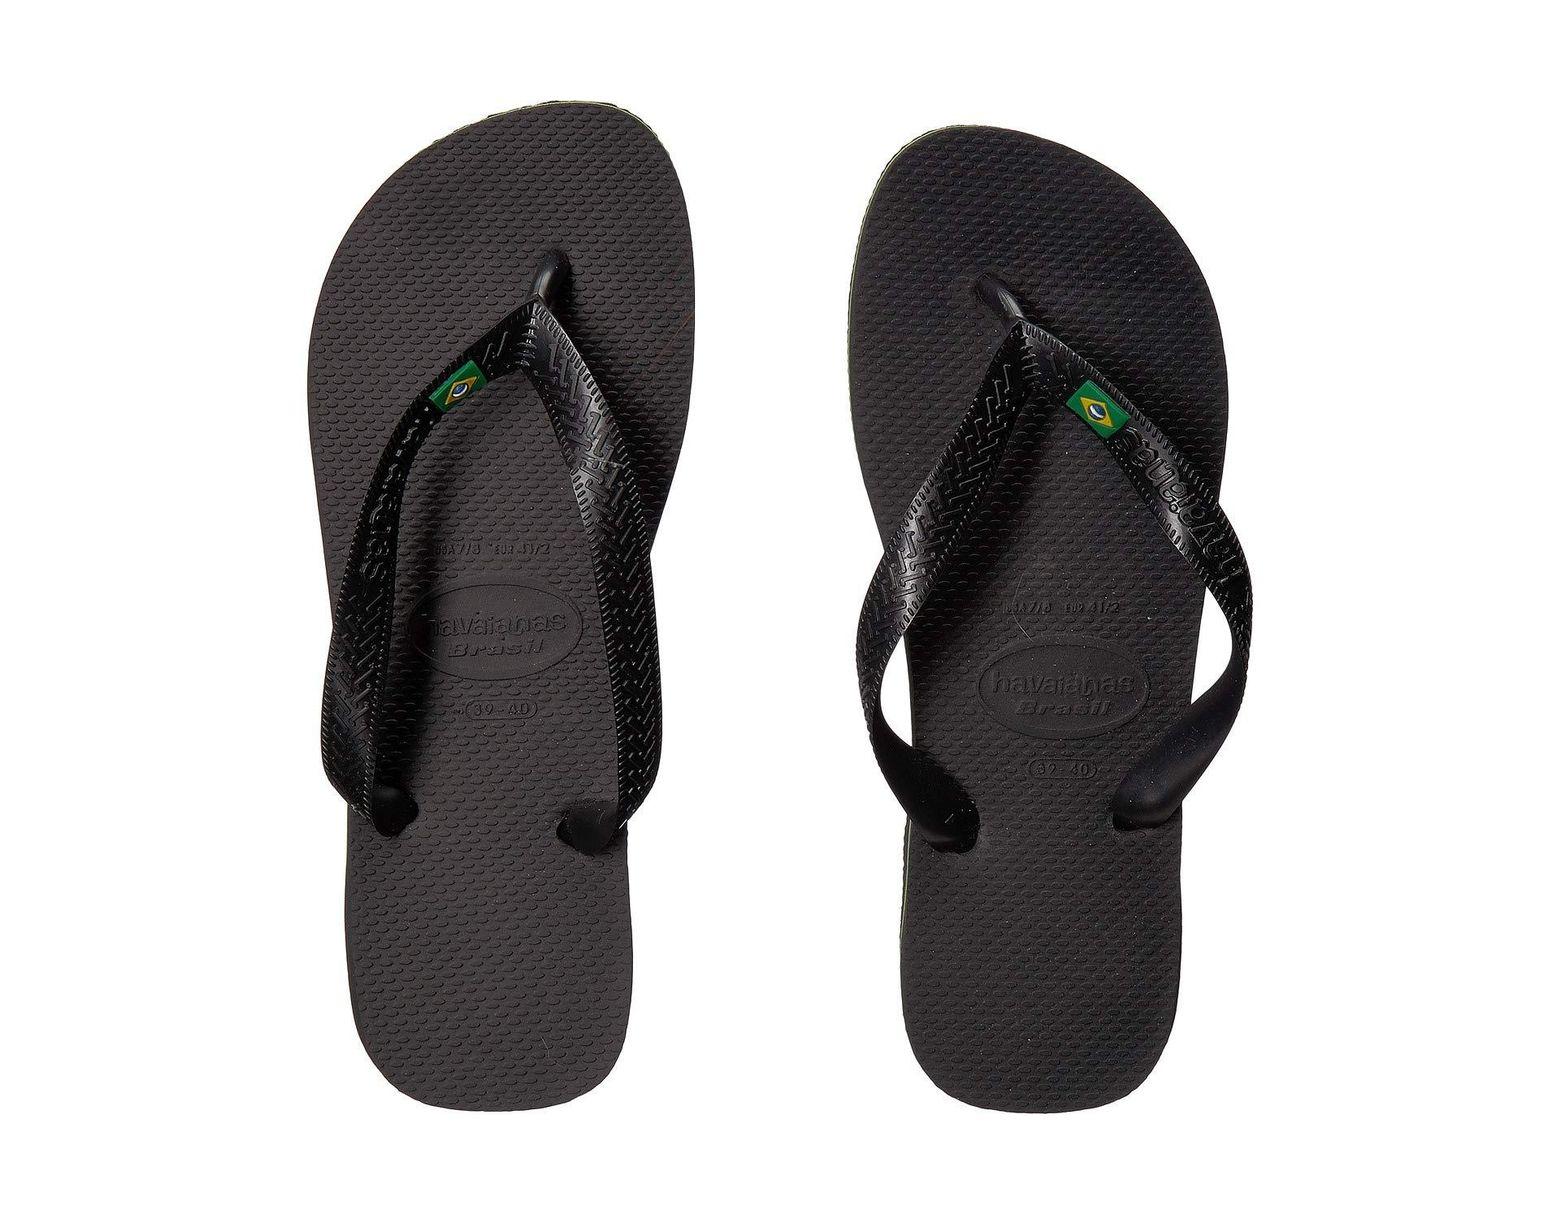 Black Flip Black FlopswhiteWomen's Brazil Sandals Black Brazil Sandals Flip Flip FlopswhiteWomen's Brazil Lq35Rjc4A